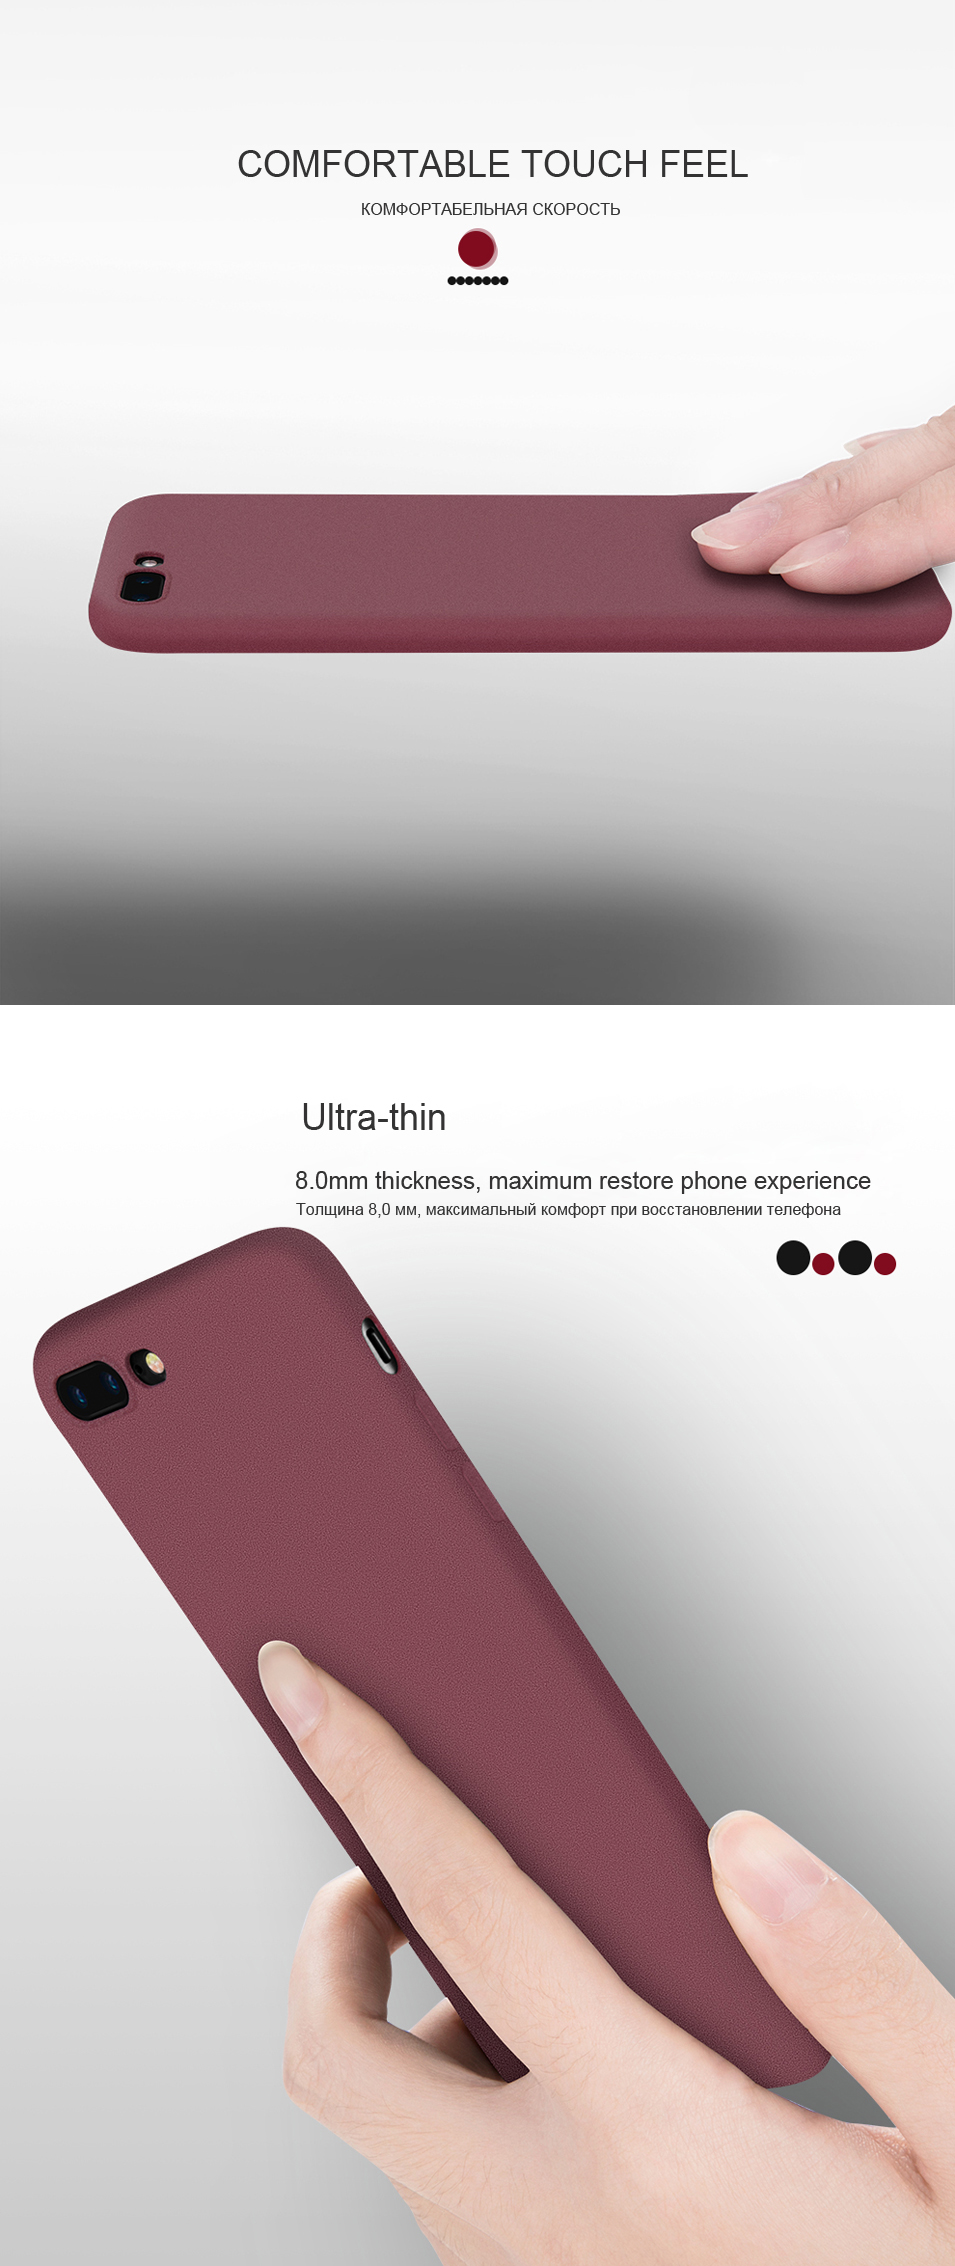 Silicone Soft TPU Matte Case for Huawei P20 P10 Lite P20 Pro P10 P9 P8 Lite 2017 P Smart Nova 2 Plus 2i 2s Case Cover Phone Bag (12)